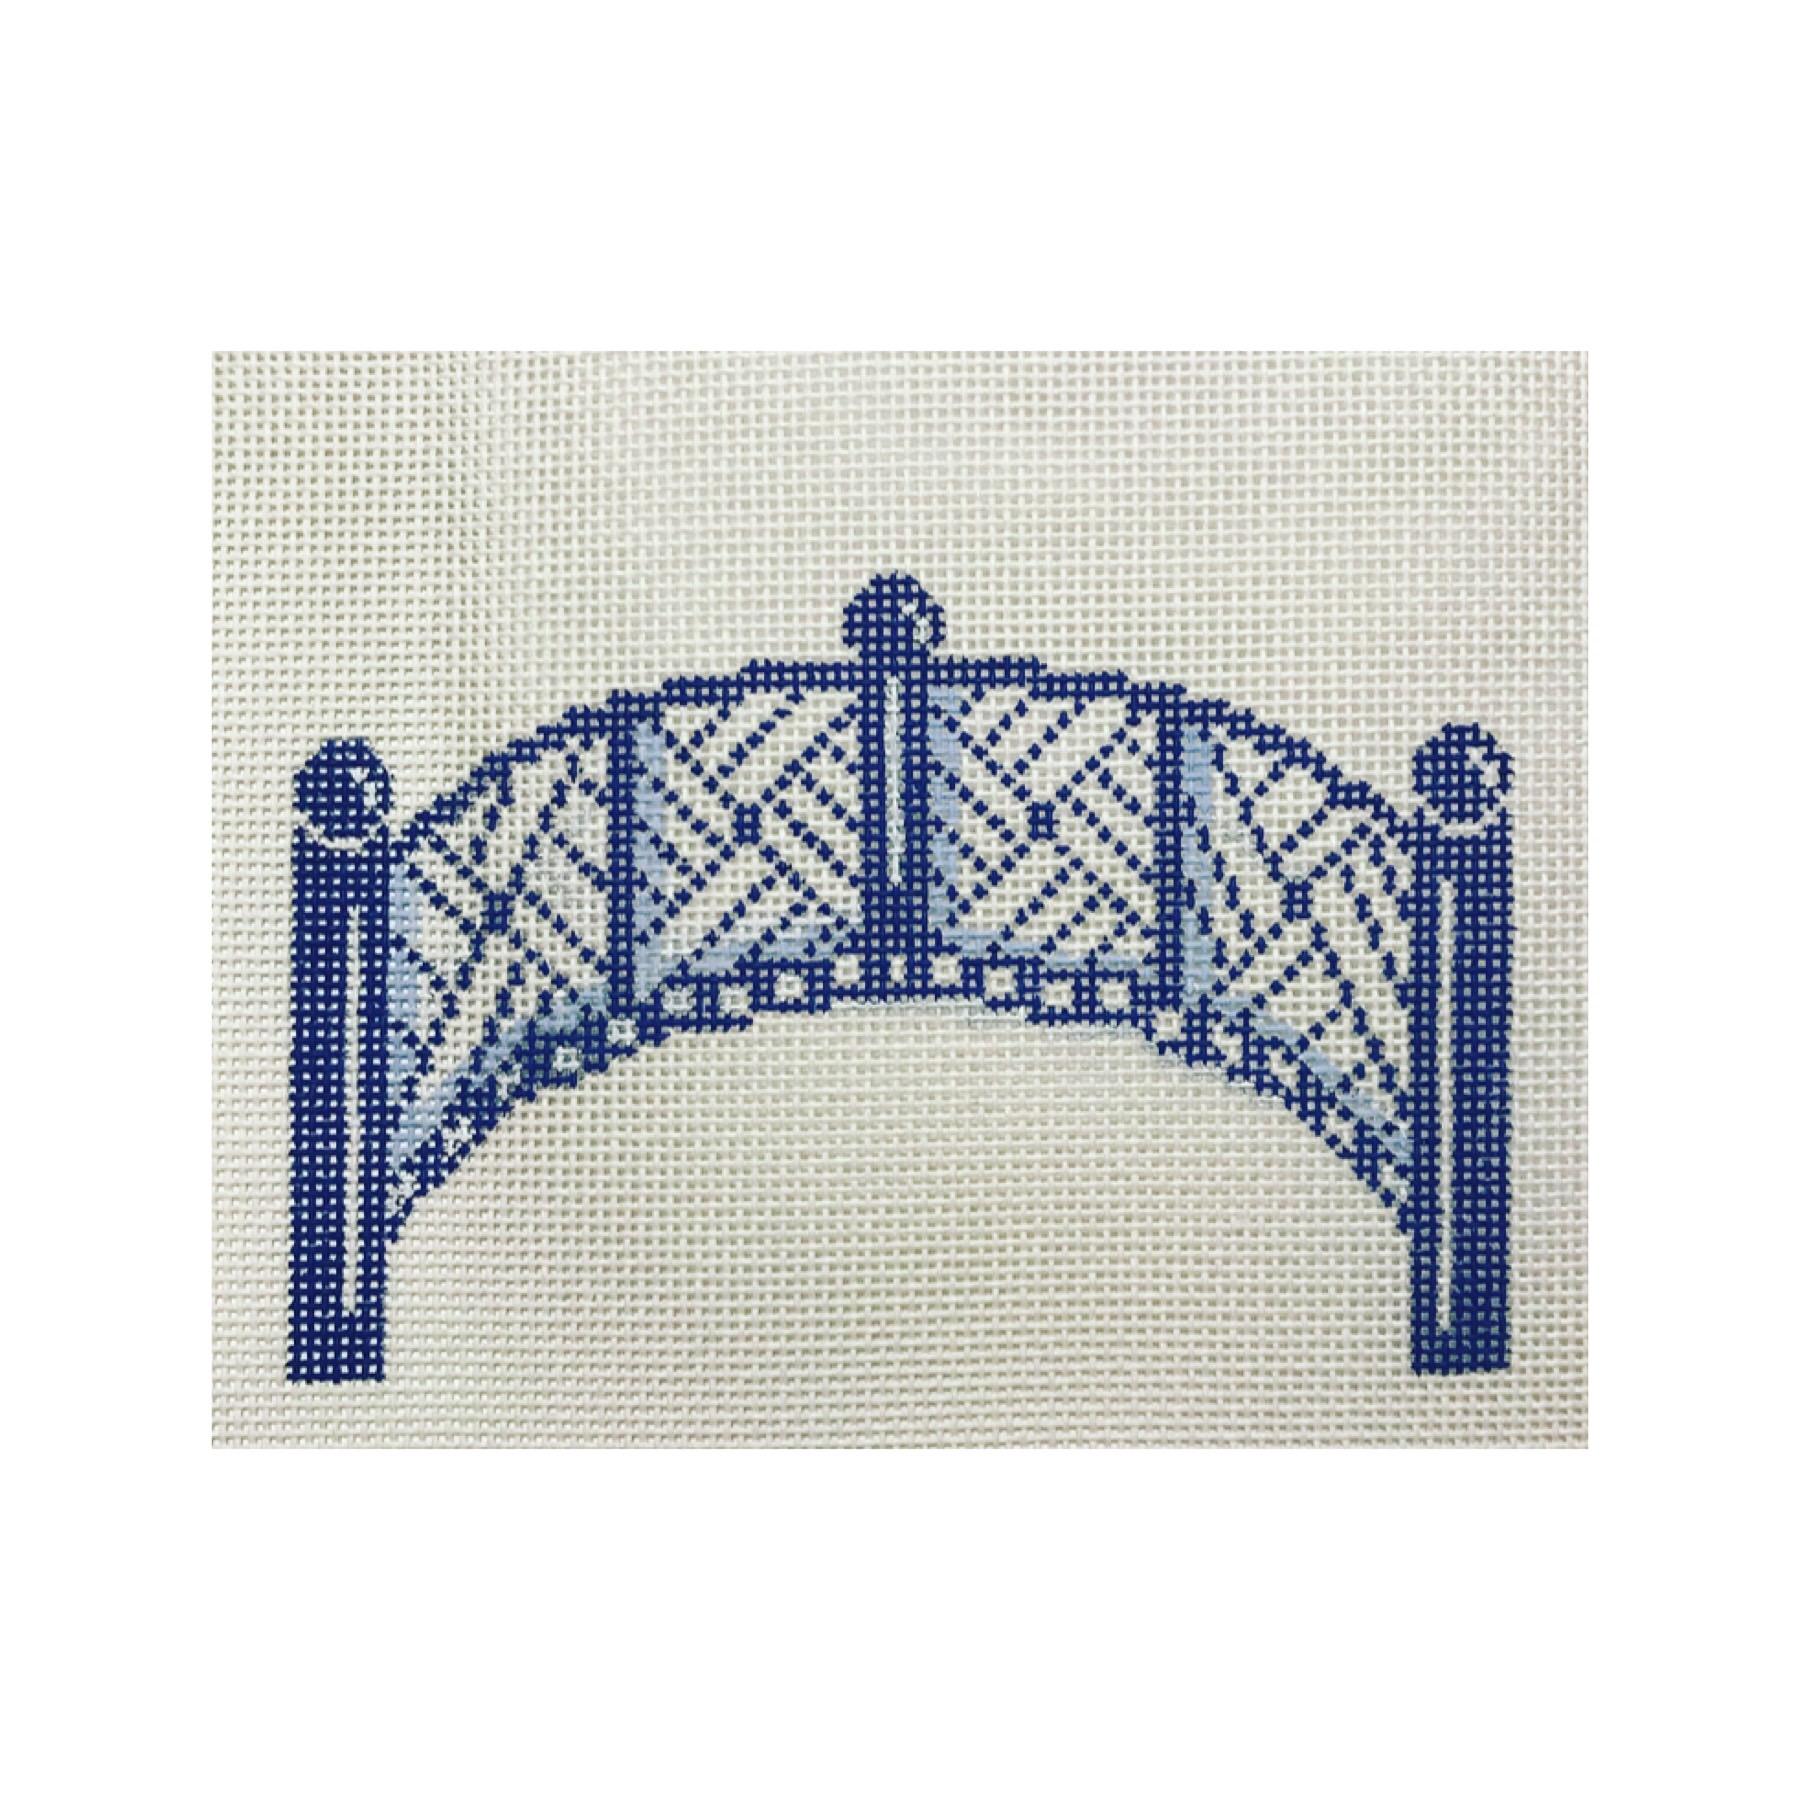 "Footbridge Ornament DM-1B  3"" x 5"" on 18 mesh"